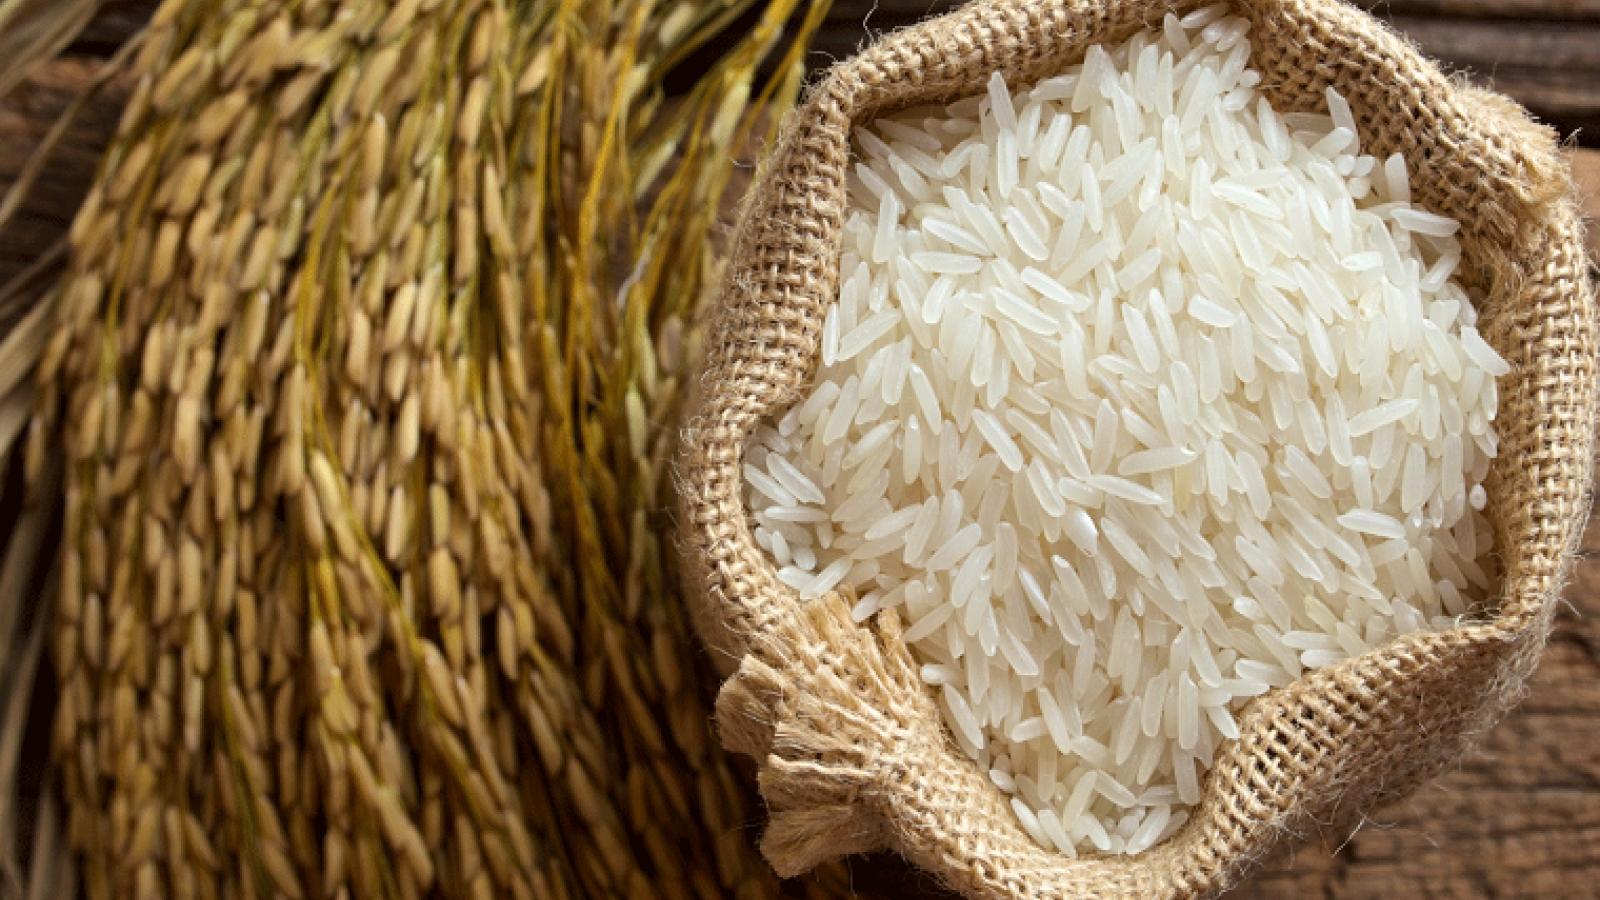 Bangkok Post highlights prudent Vietnamese rice strategy